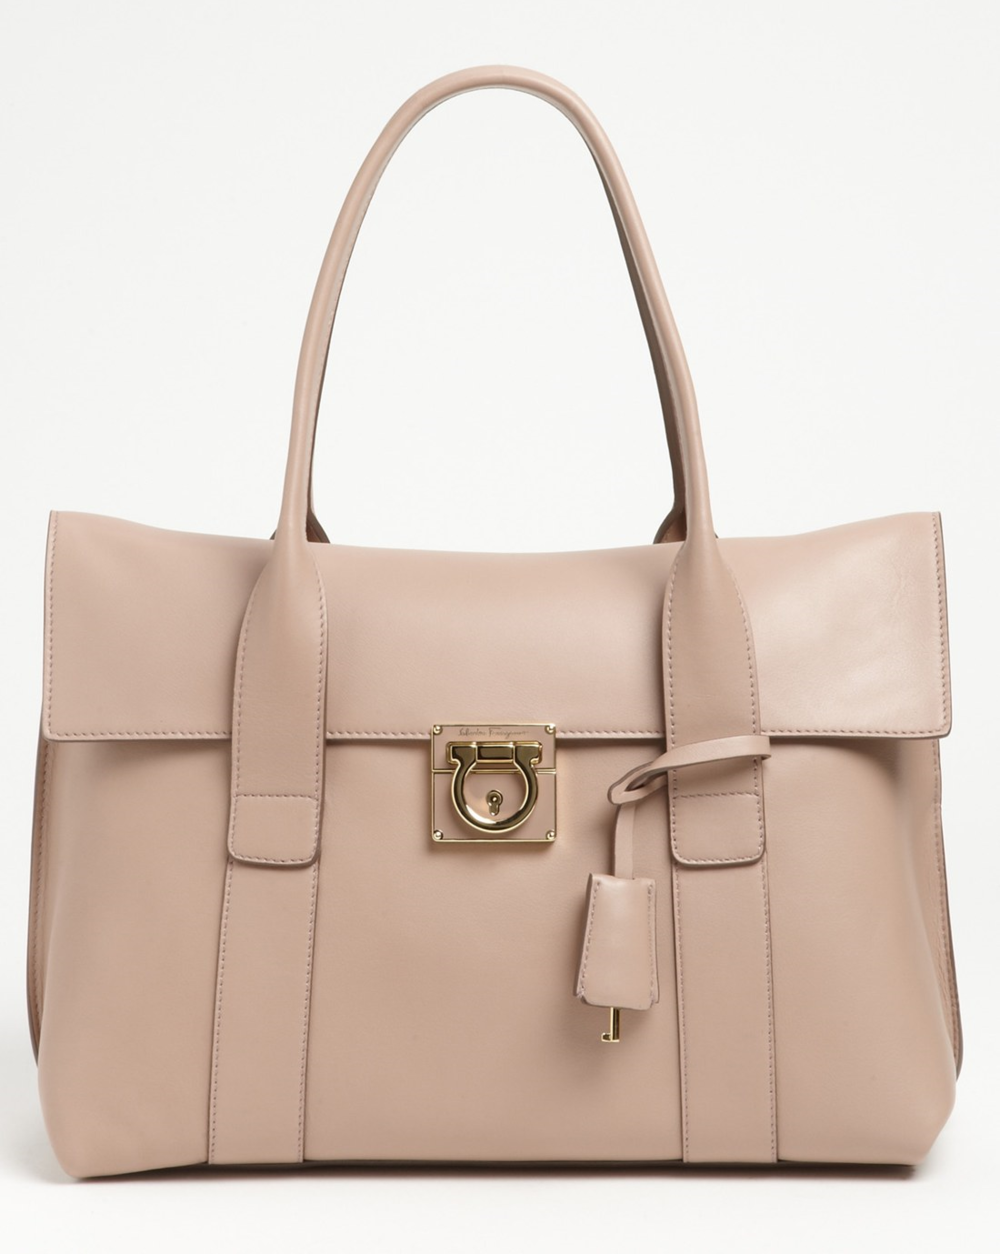 Salvatore-Ferragamo-Sookie-Leather-Shopper-For-Women-454-1.jpg